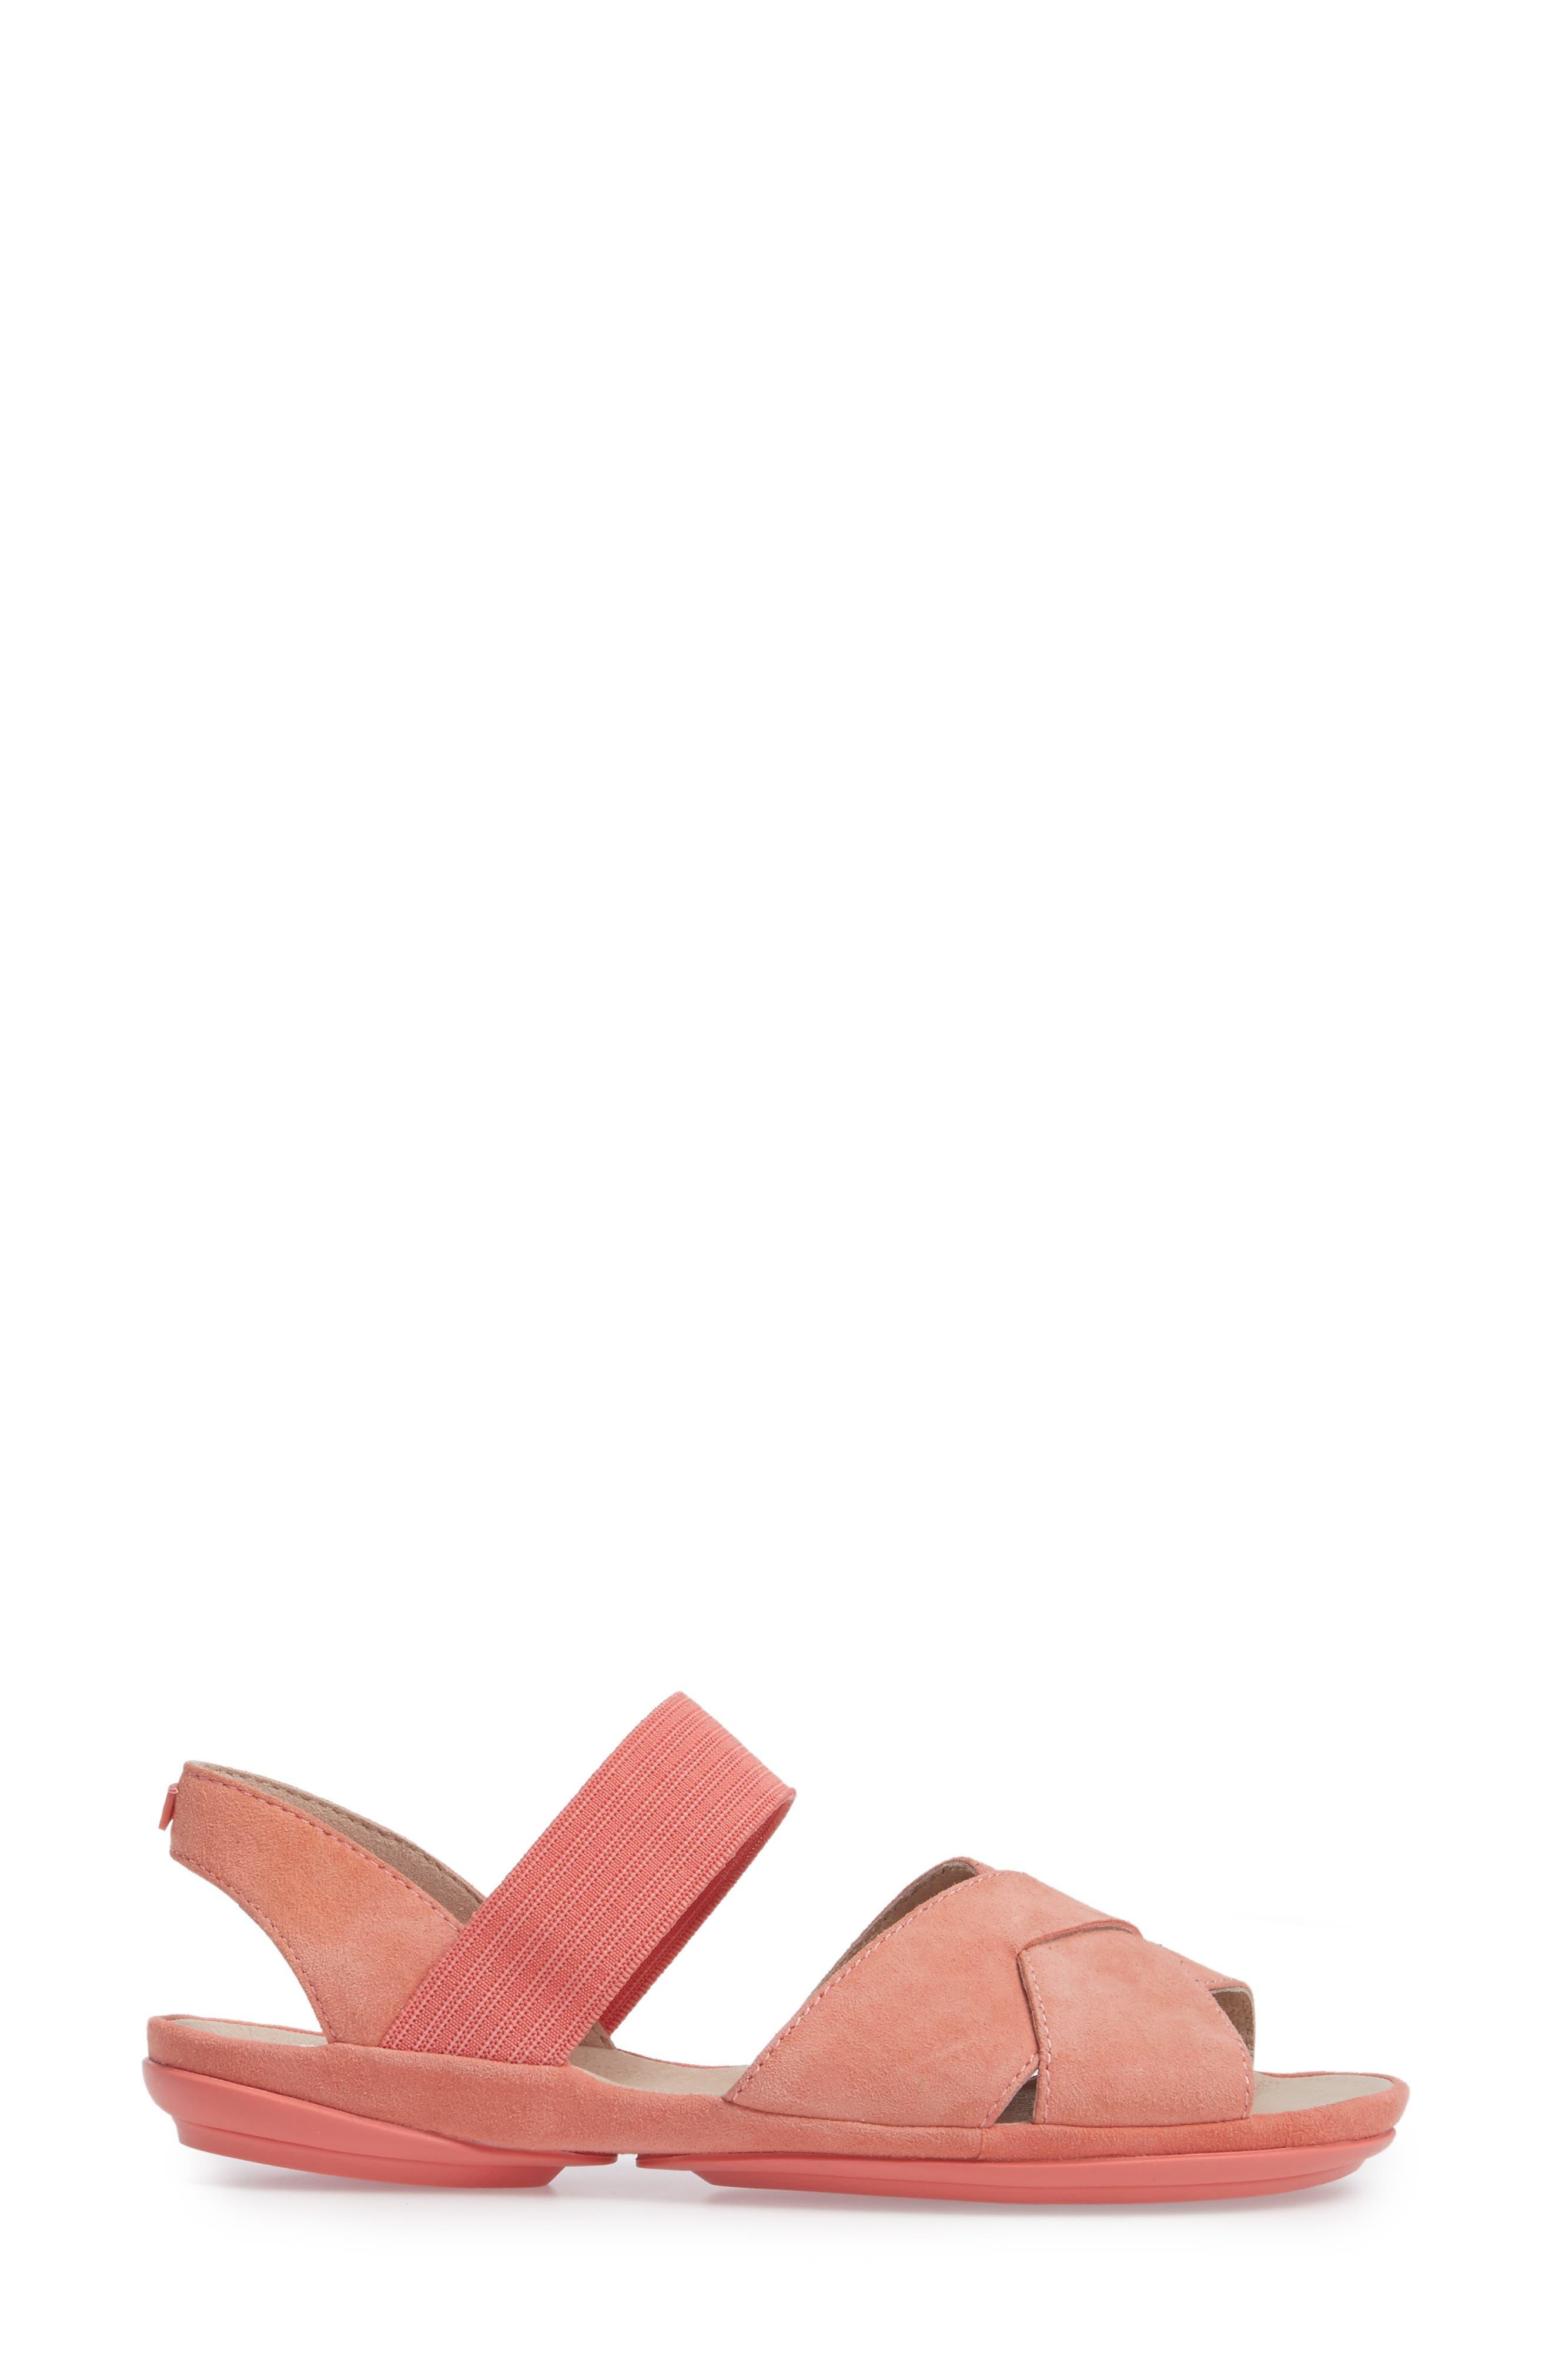 Alternate Image 3  - Camper Right Nina Flat Cross Strap Sandal (Women)